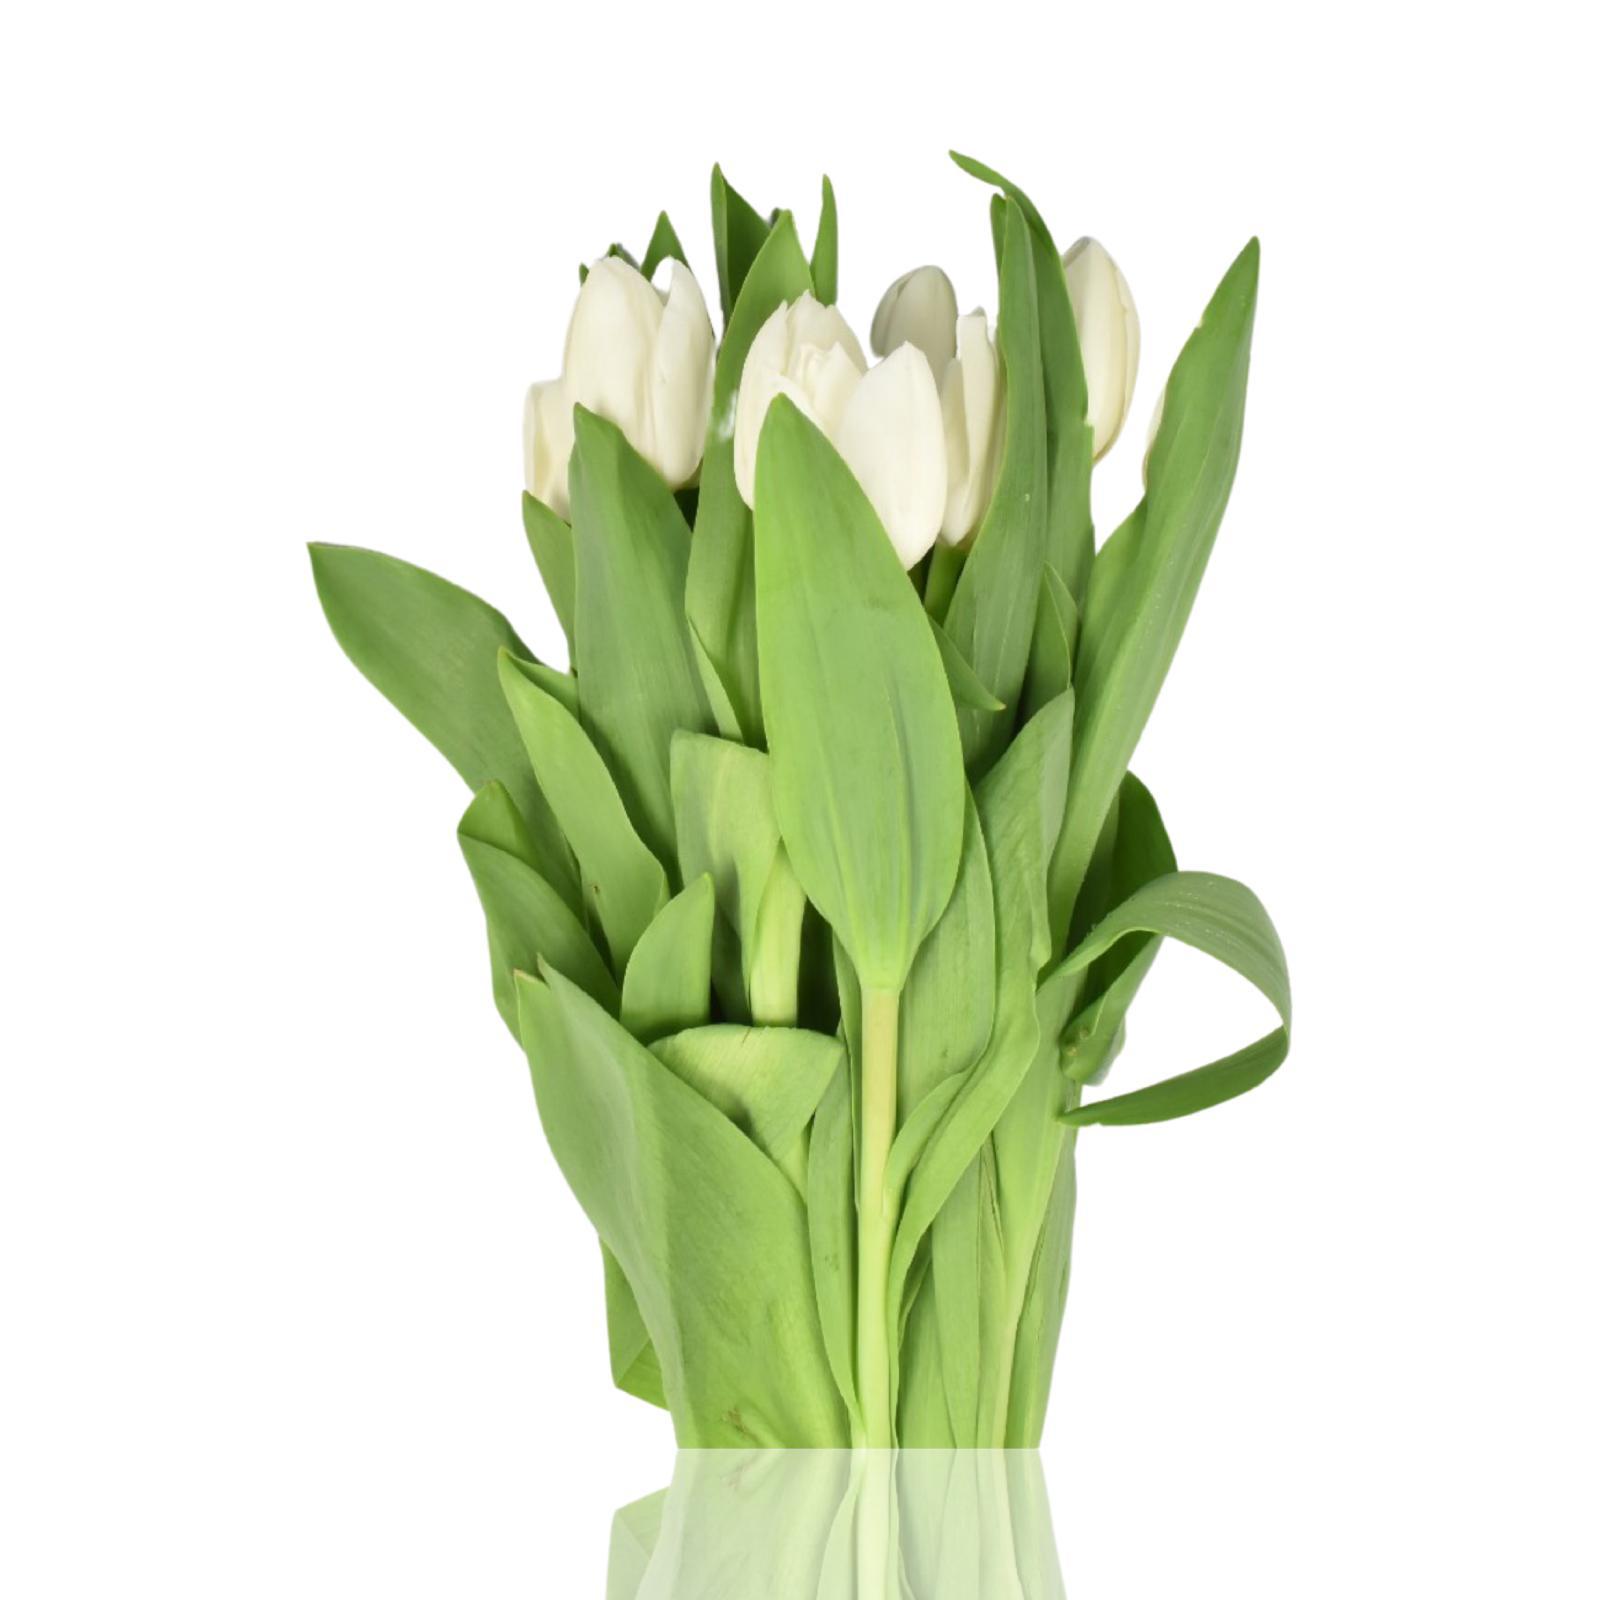 Tulip Pure White 'Wholesale Flowers Cut Flowers